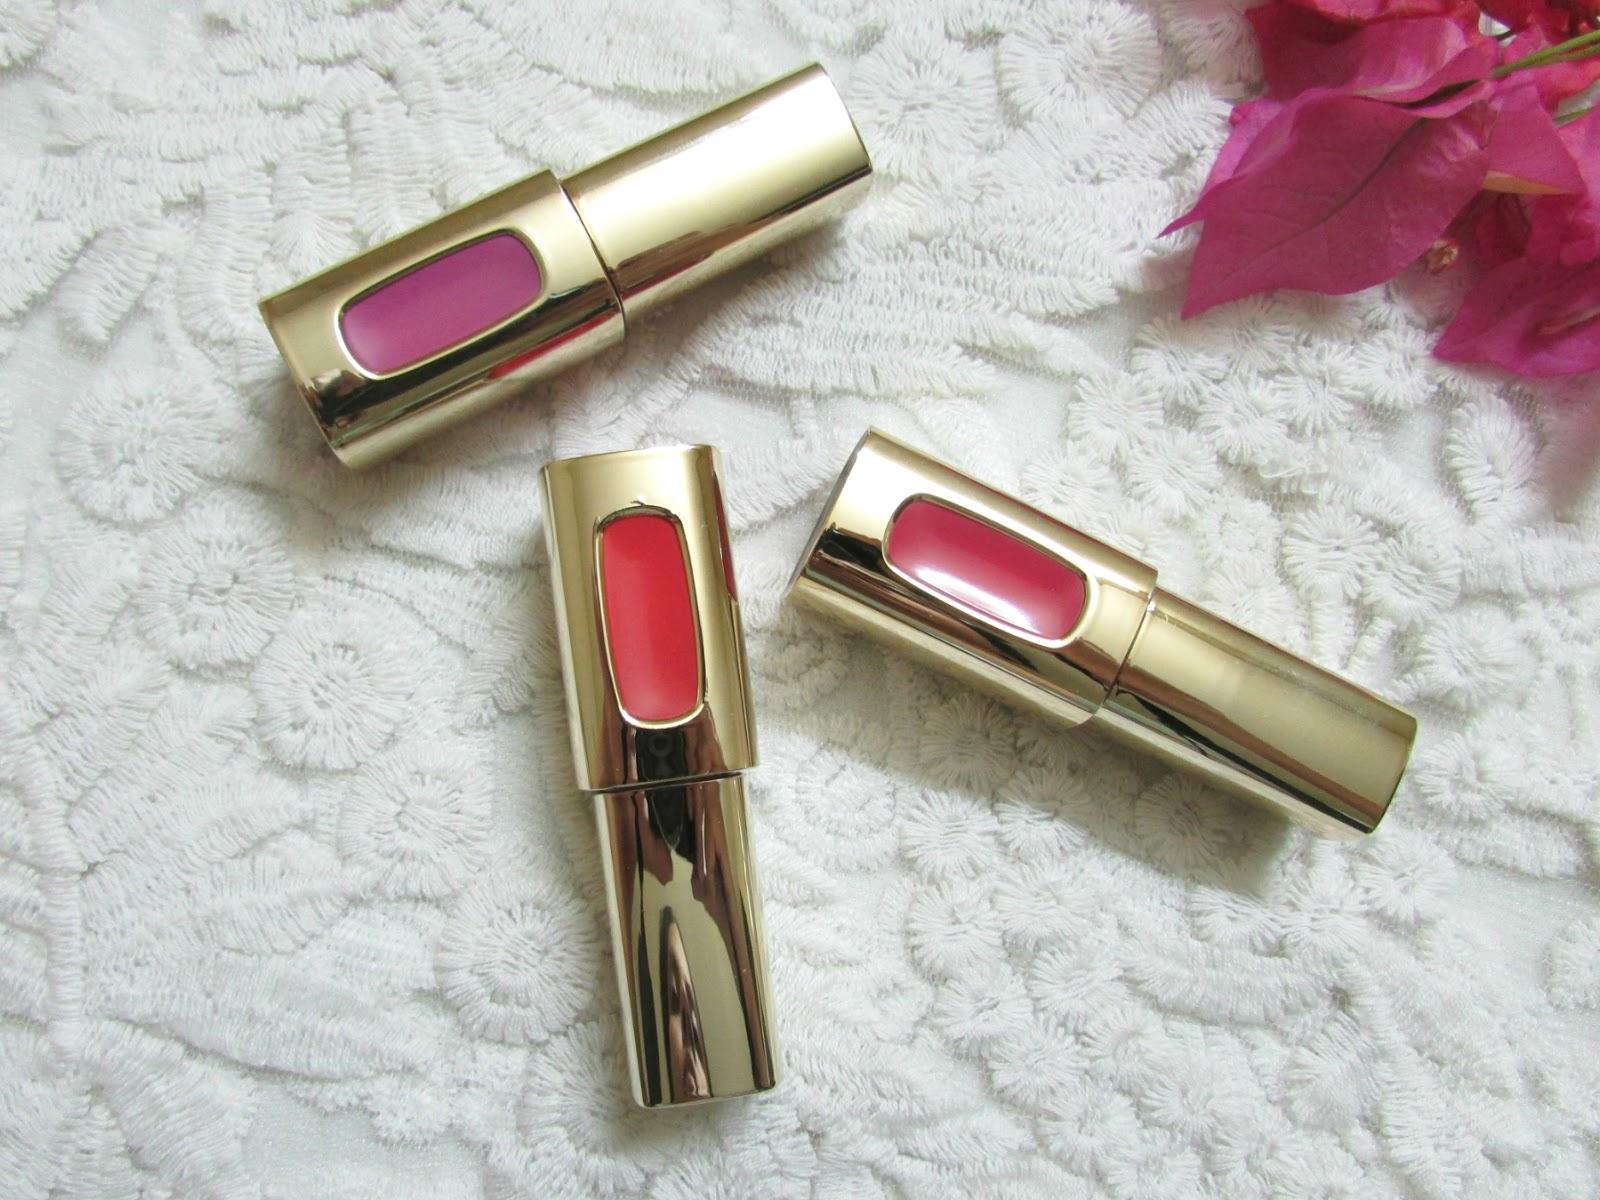 L Oreal L Extraordinaire Liquid Lipstick Price Review